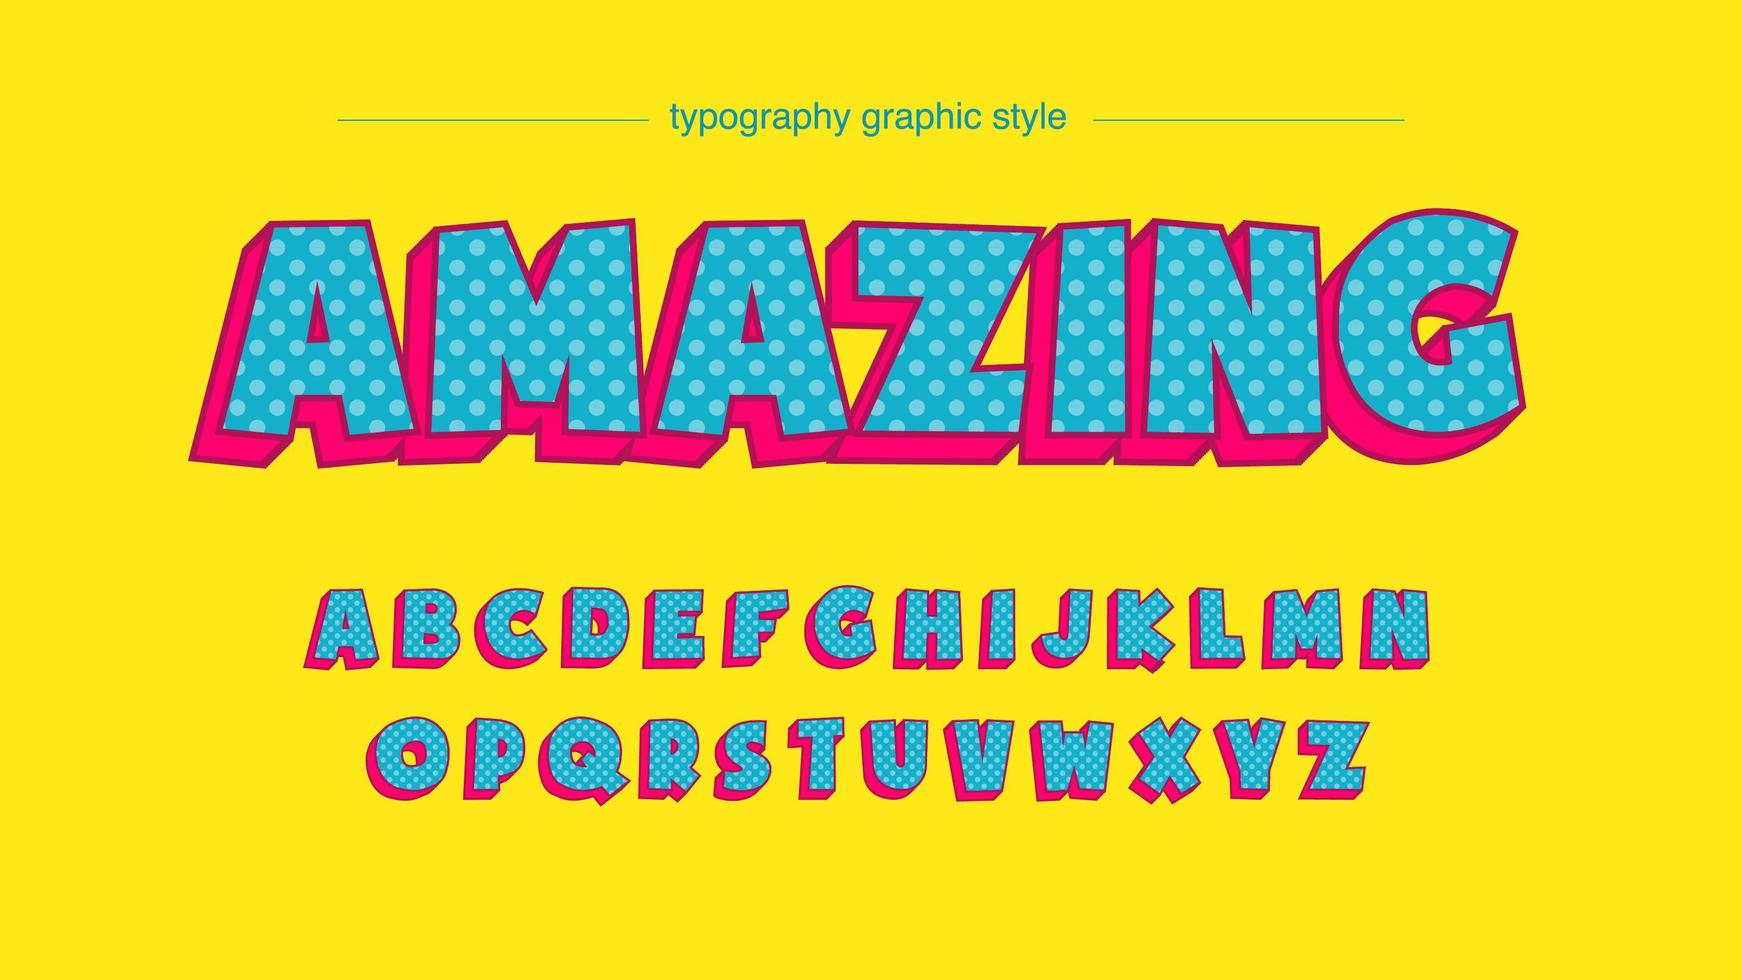 blå polka dot fet 3d-tecknad typografi vektor